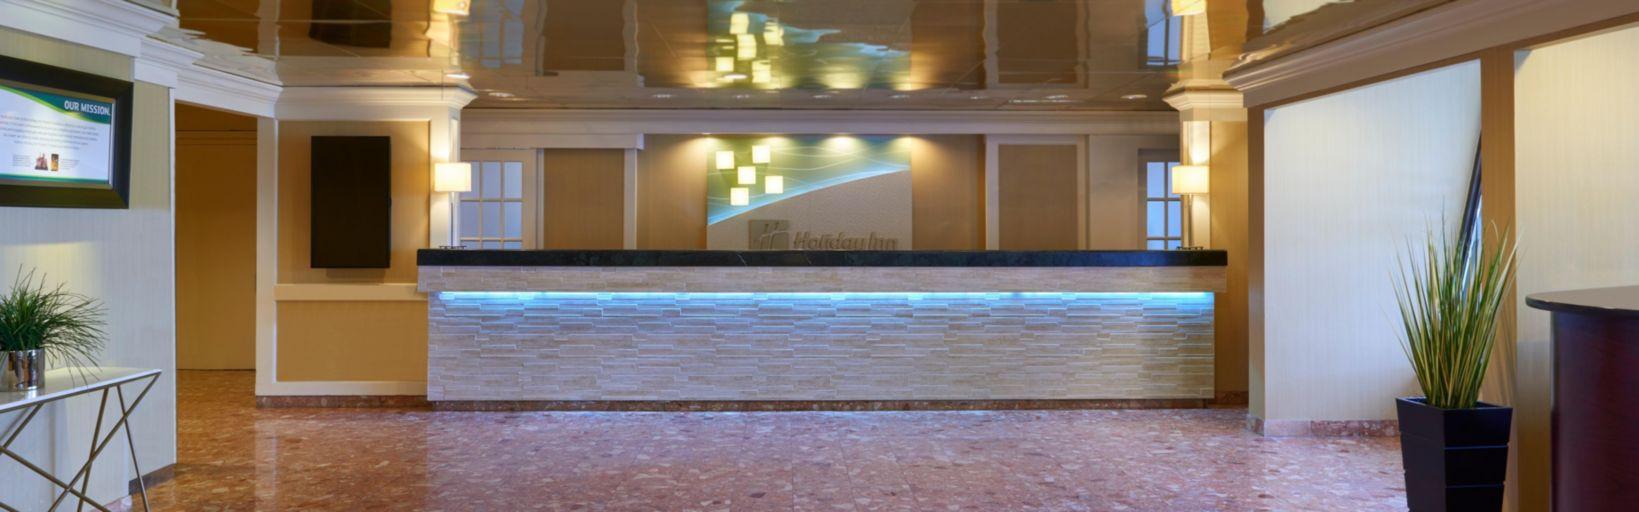 aaa hardwood flooring etobicoke of holiday inn toronto yorkdale hotel by ihg pertaining to toronto hotel front desk at holiday inn toronto yorkdale